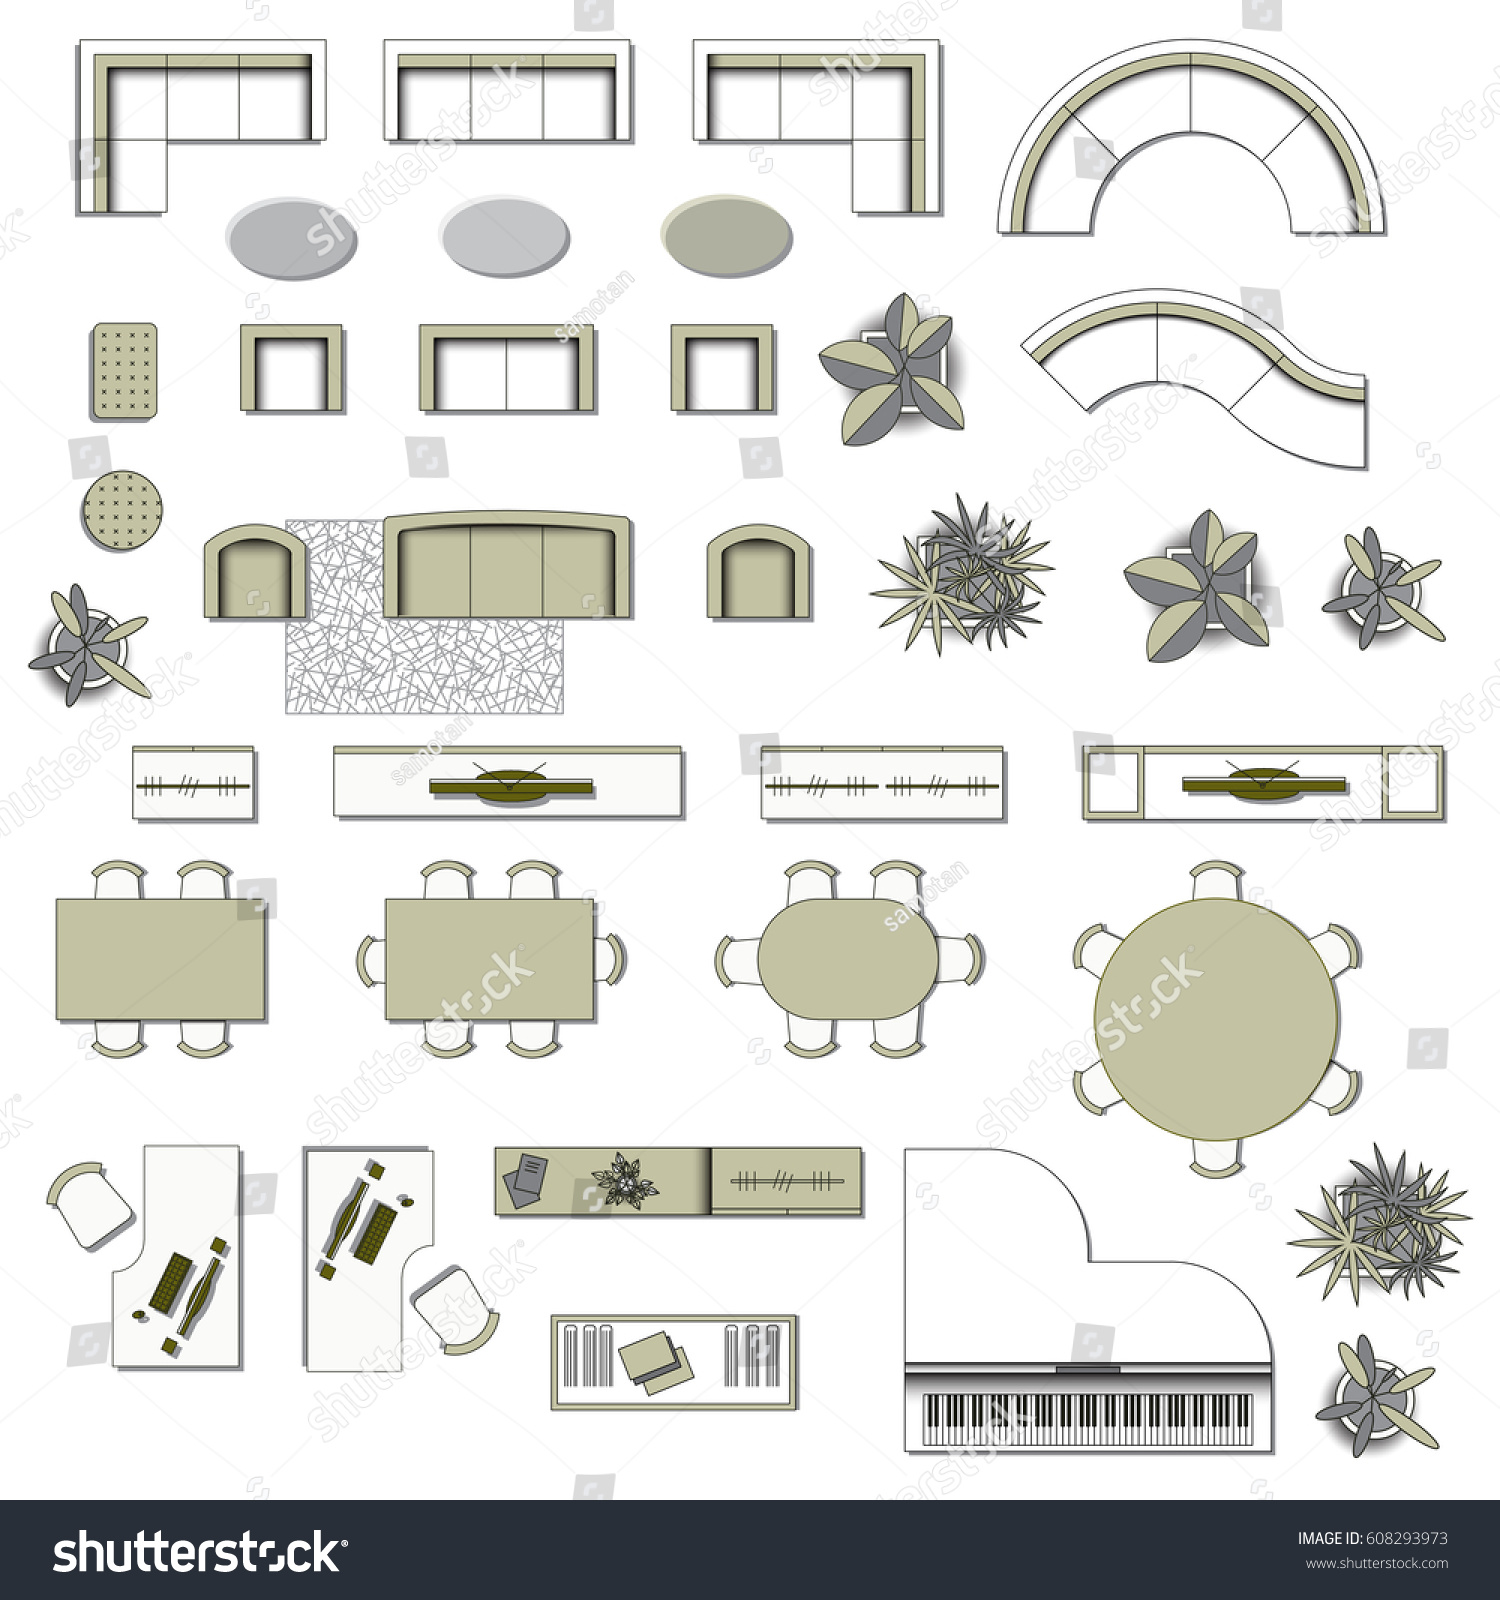 Set Interior Design House Rooms Furniture Stock Vector: Set Top View Interior Icon Design Stock Vector 608293973